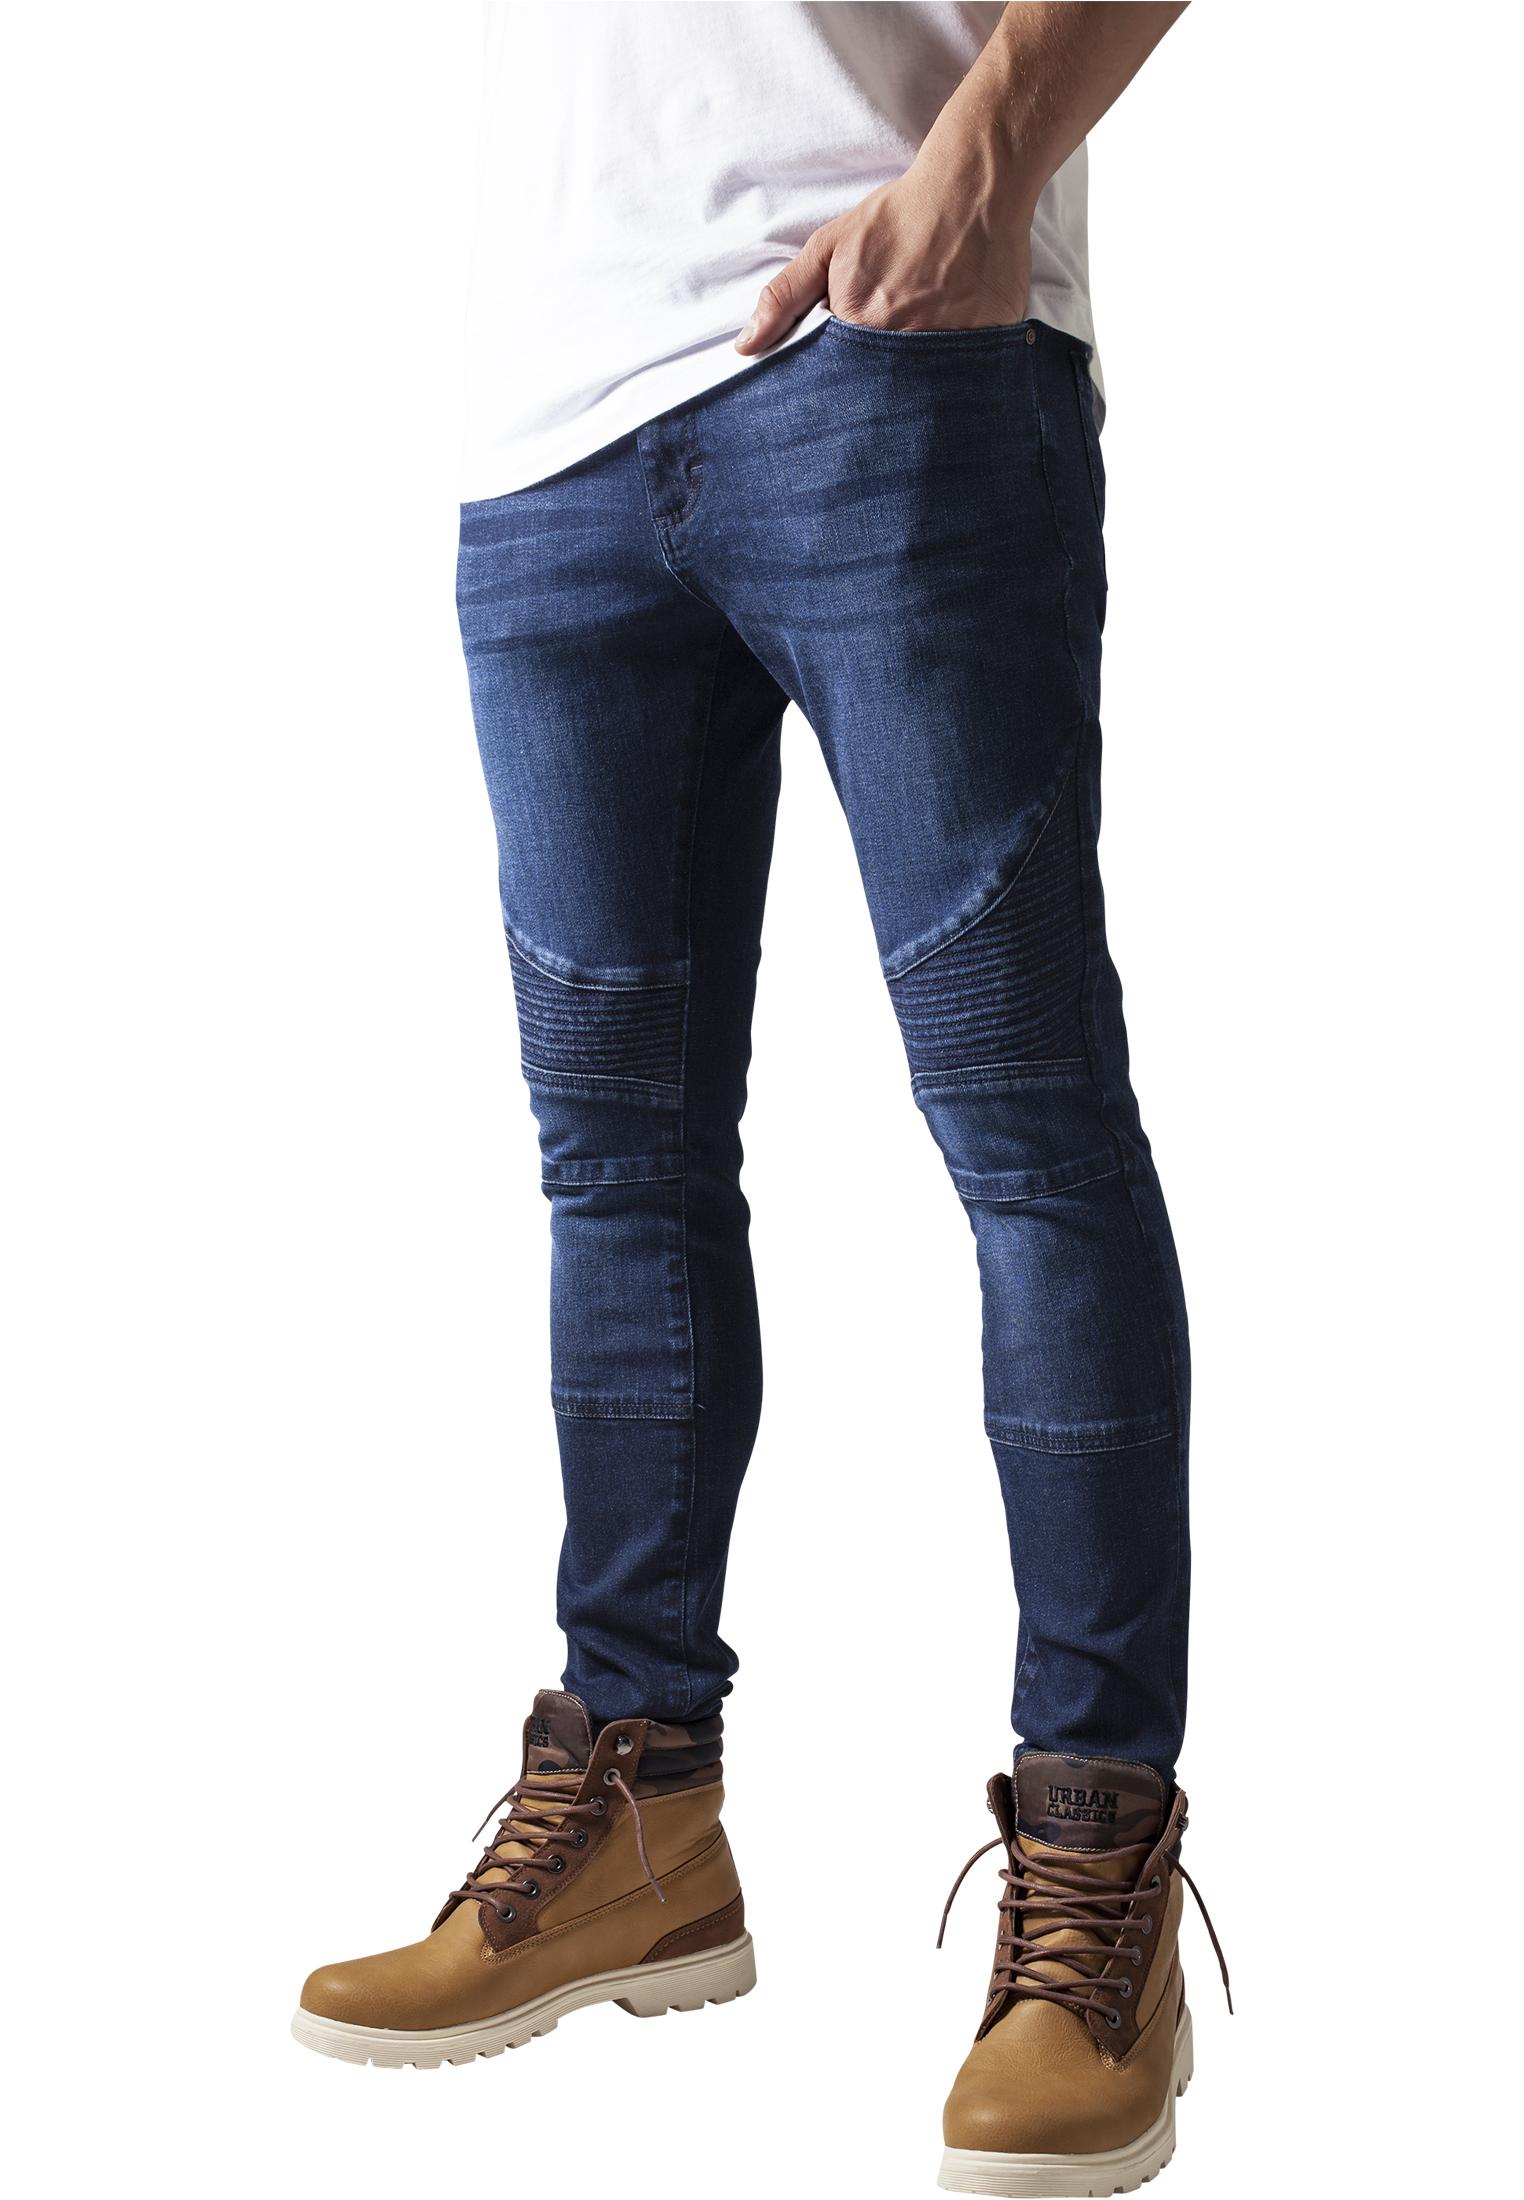 Urban Classics Jeans Biker Jeanshose Slim blue washed